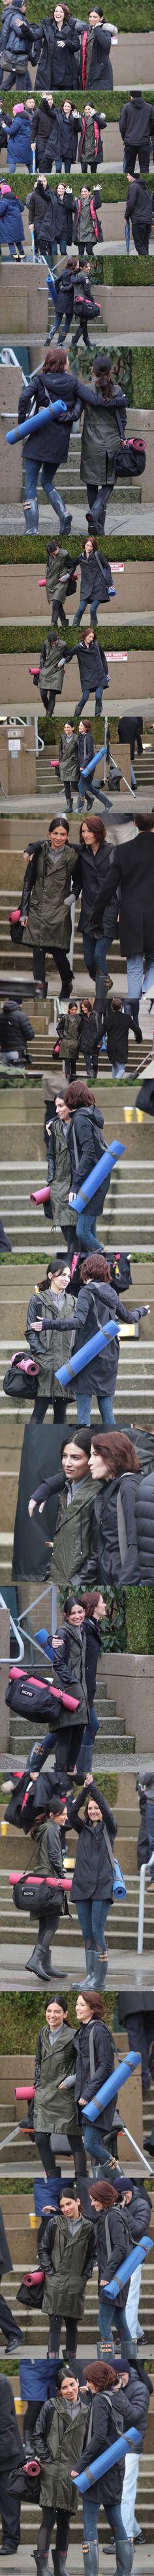 Sanvers filming for 2x17 - Alex Danvers - Maggie Sawyer - Supergirl - Season 2. Love them.